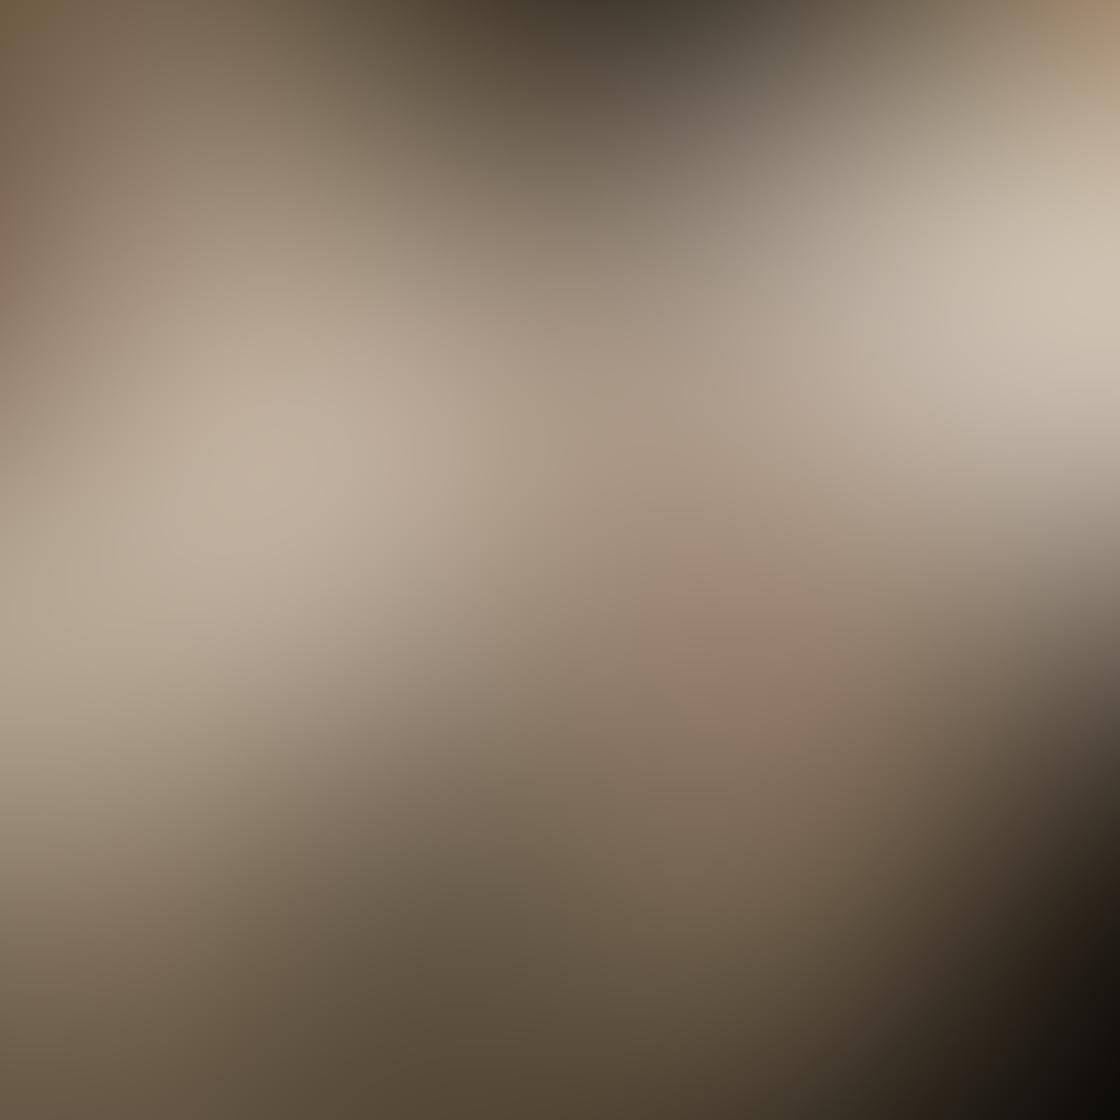 iPhone Angle Photo 07